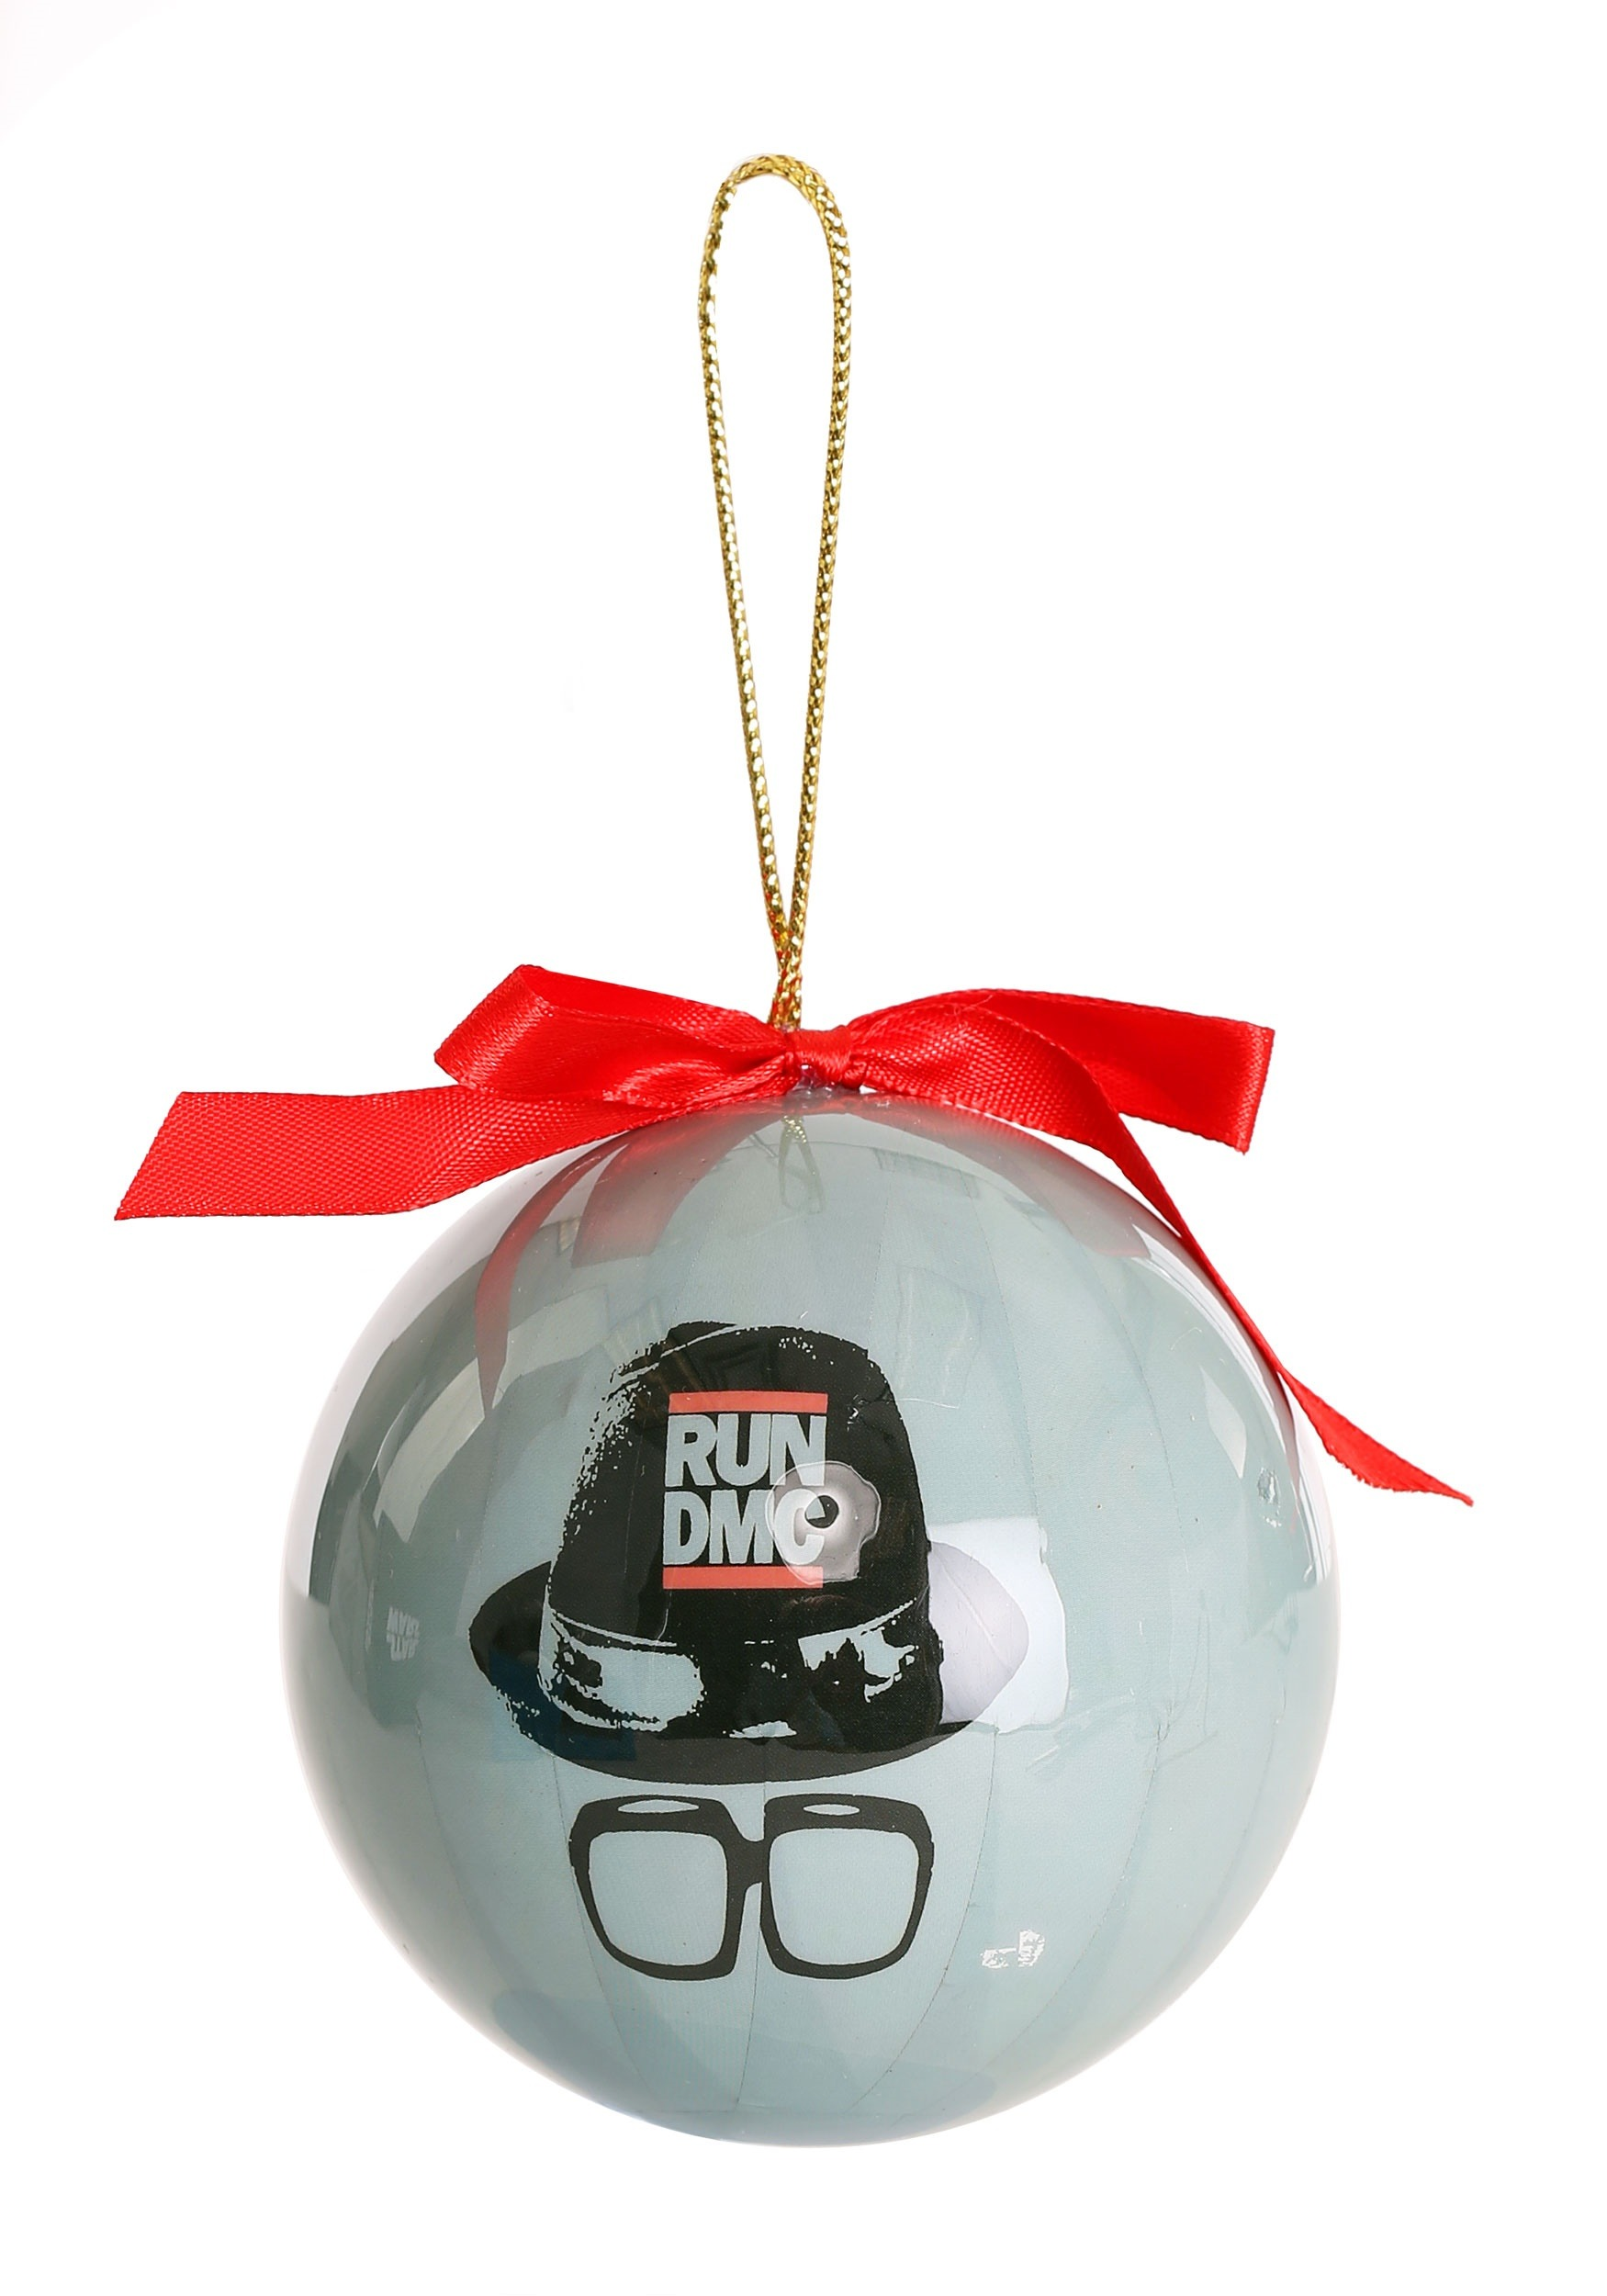 RUN DMC Christmas Ornament